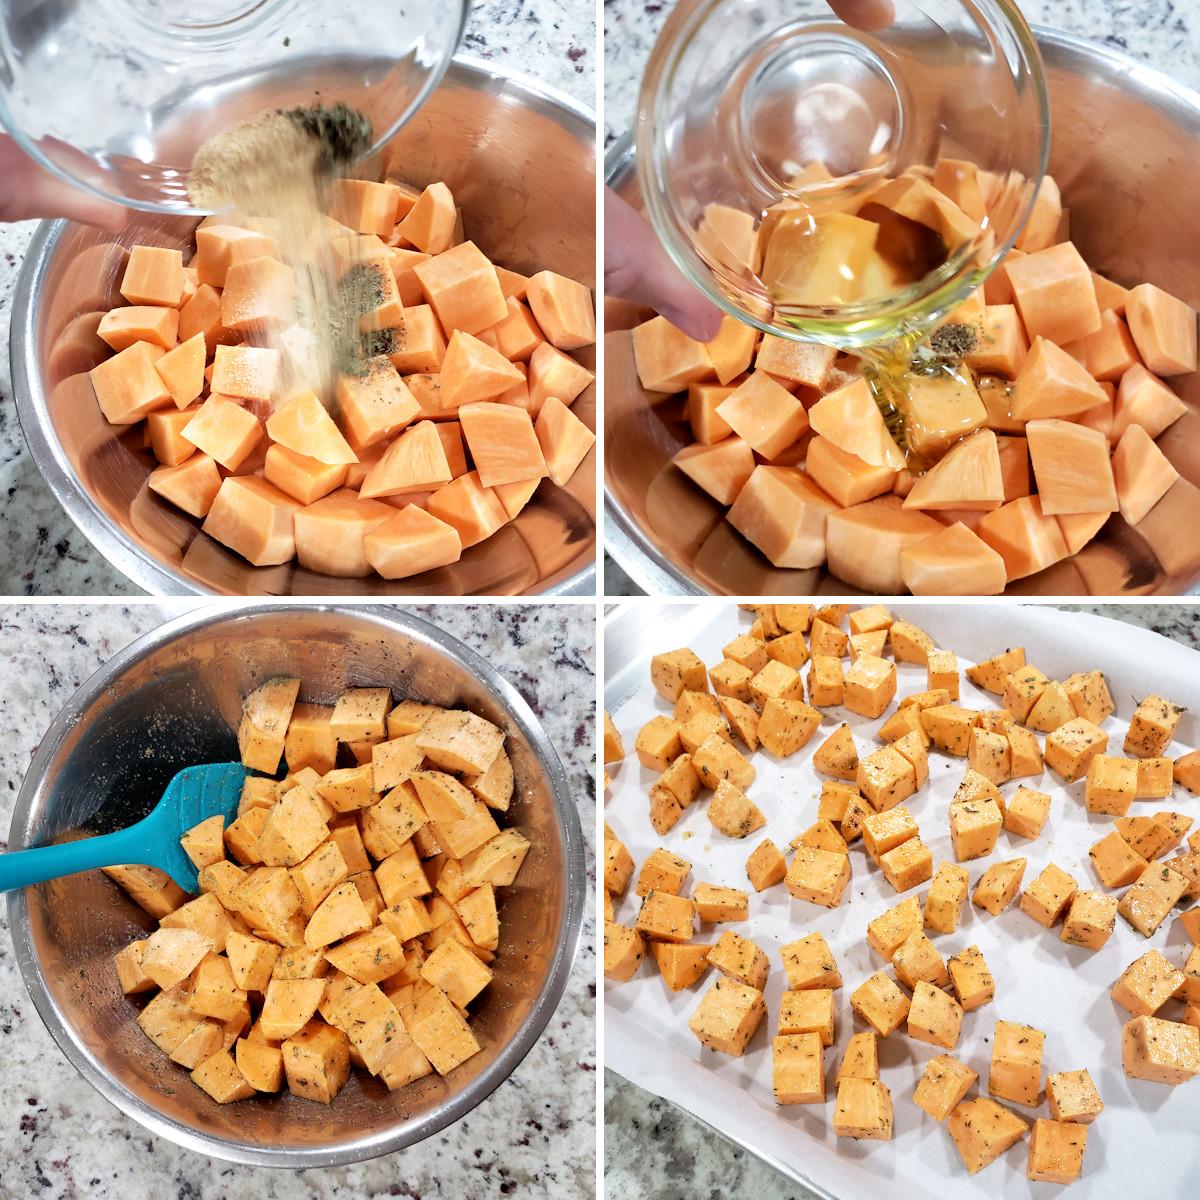 Preparing cubed sweet potatoes for roasting.